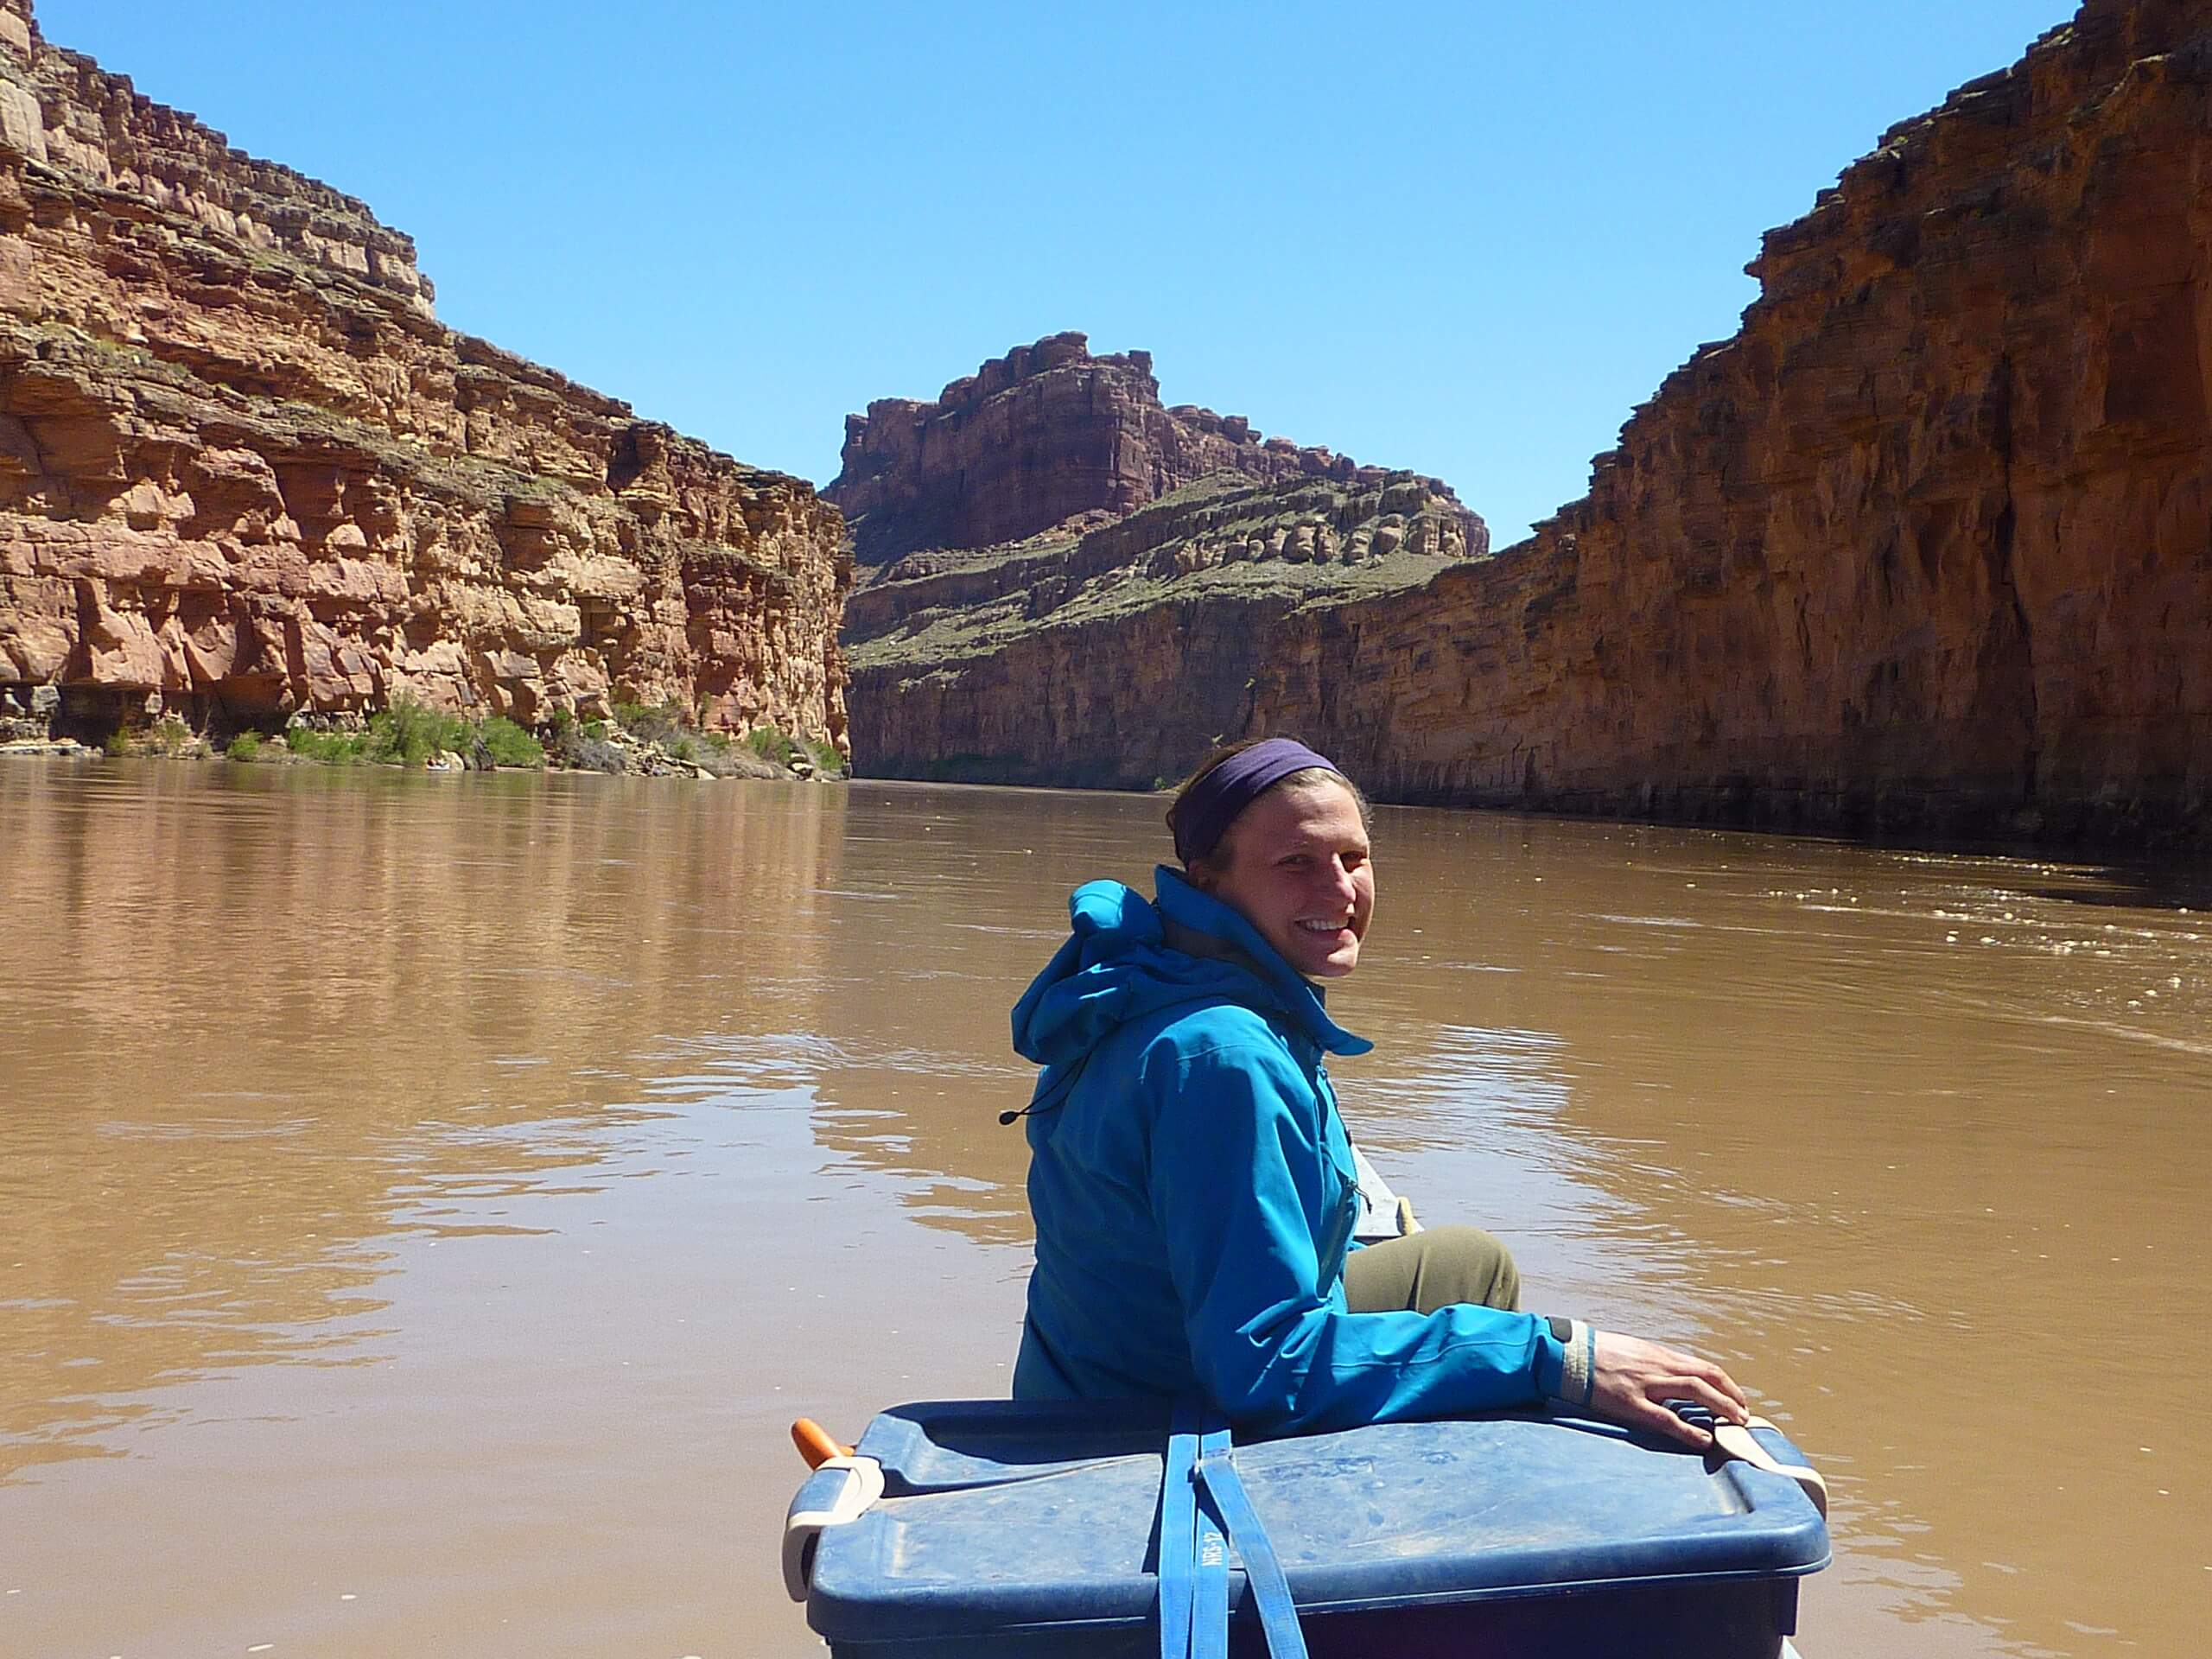 Canoeing the Colorado River with Wisconsin Canoe Company